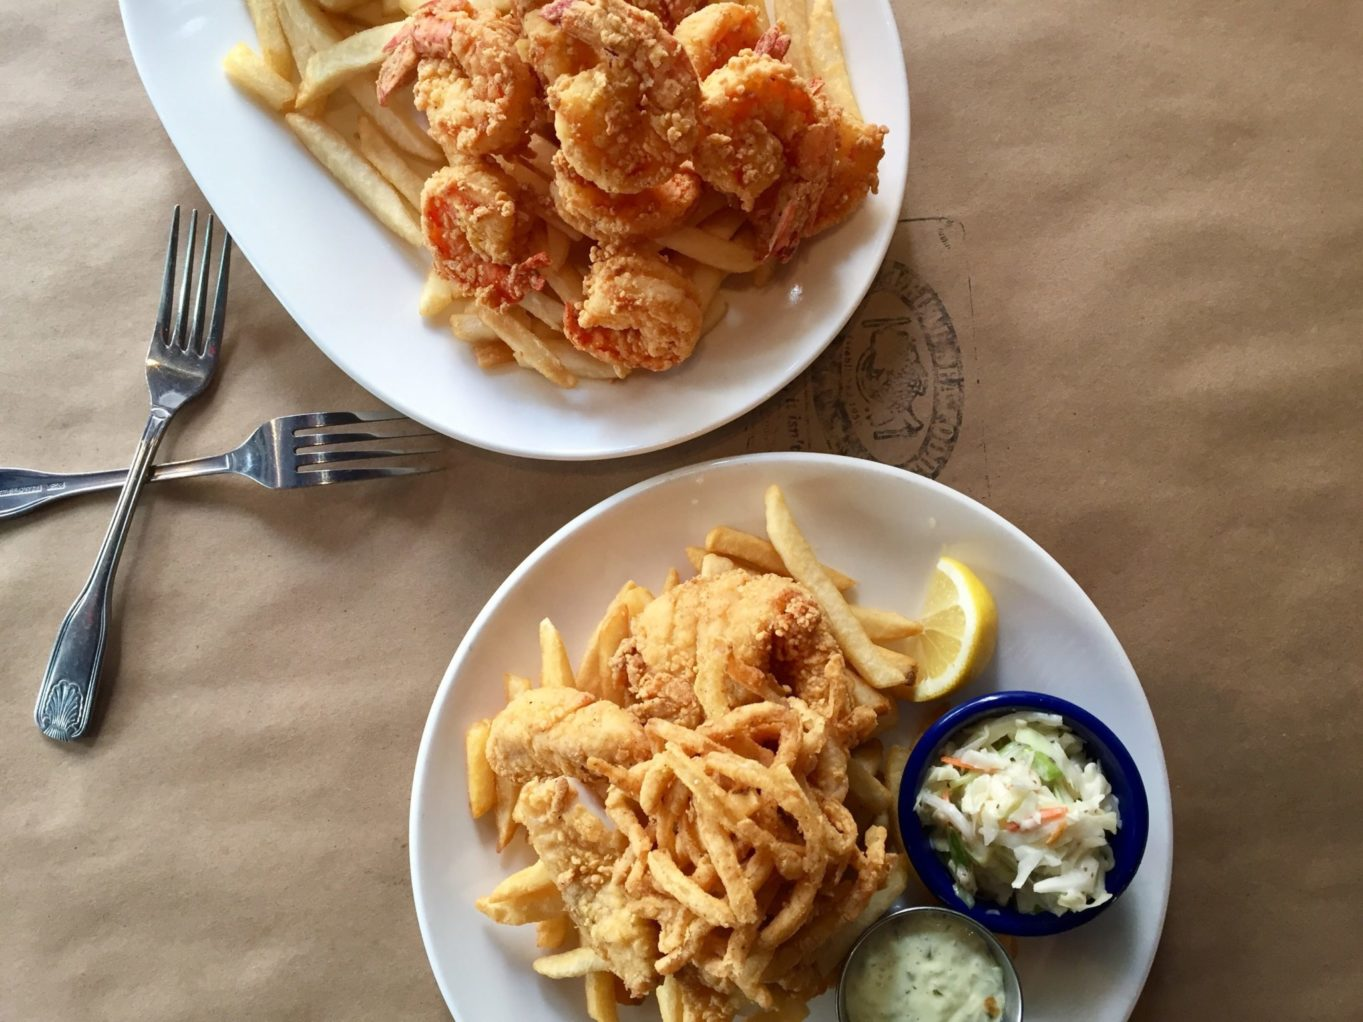 The Best Gluten Free Restaurants Food In Us Airports Gff